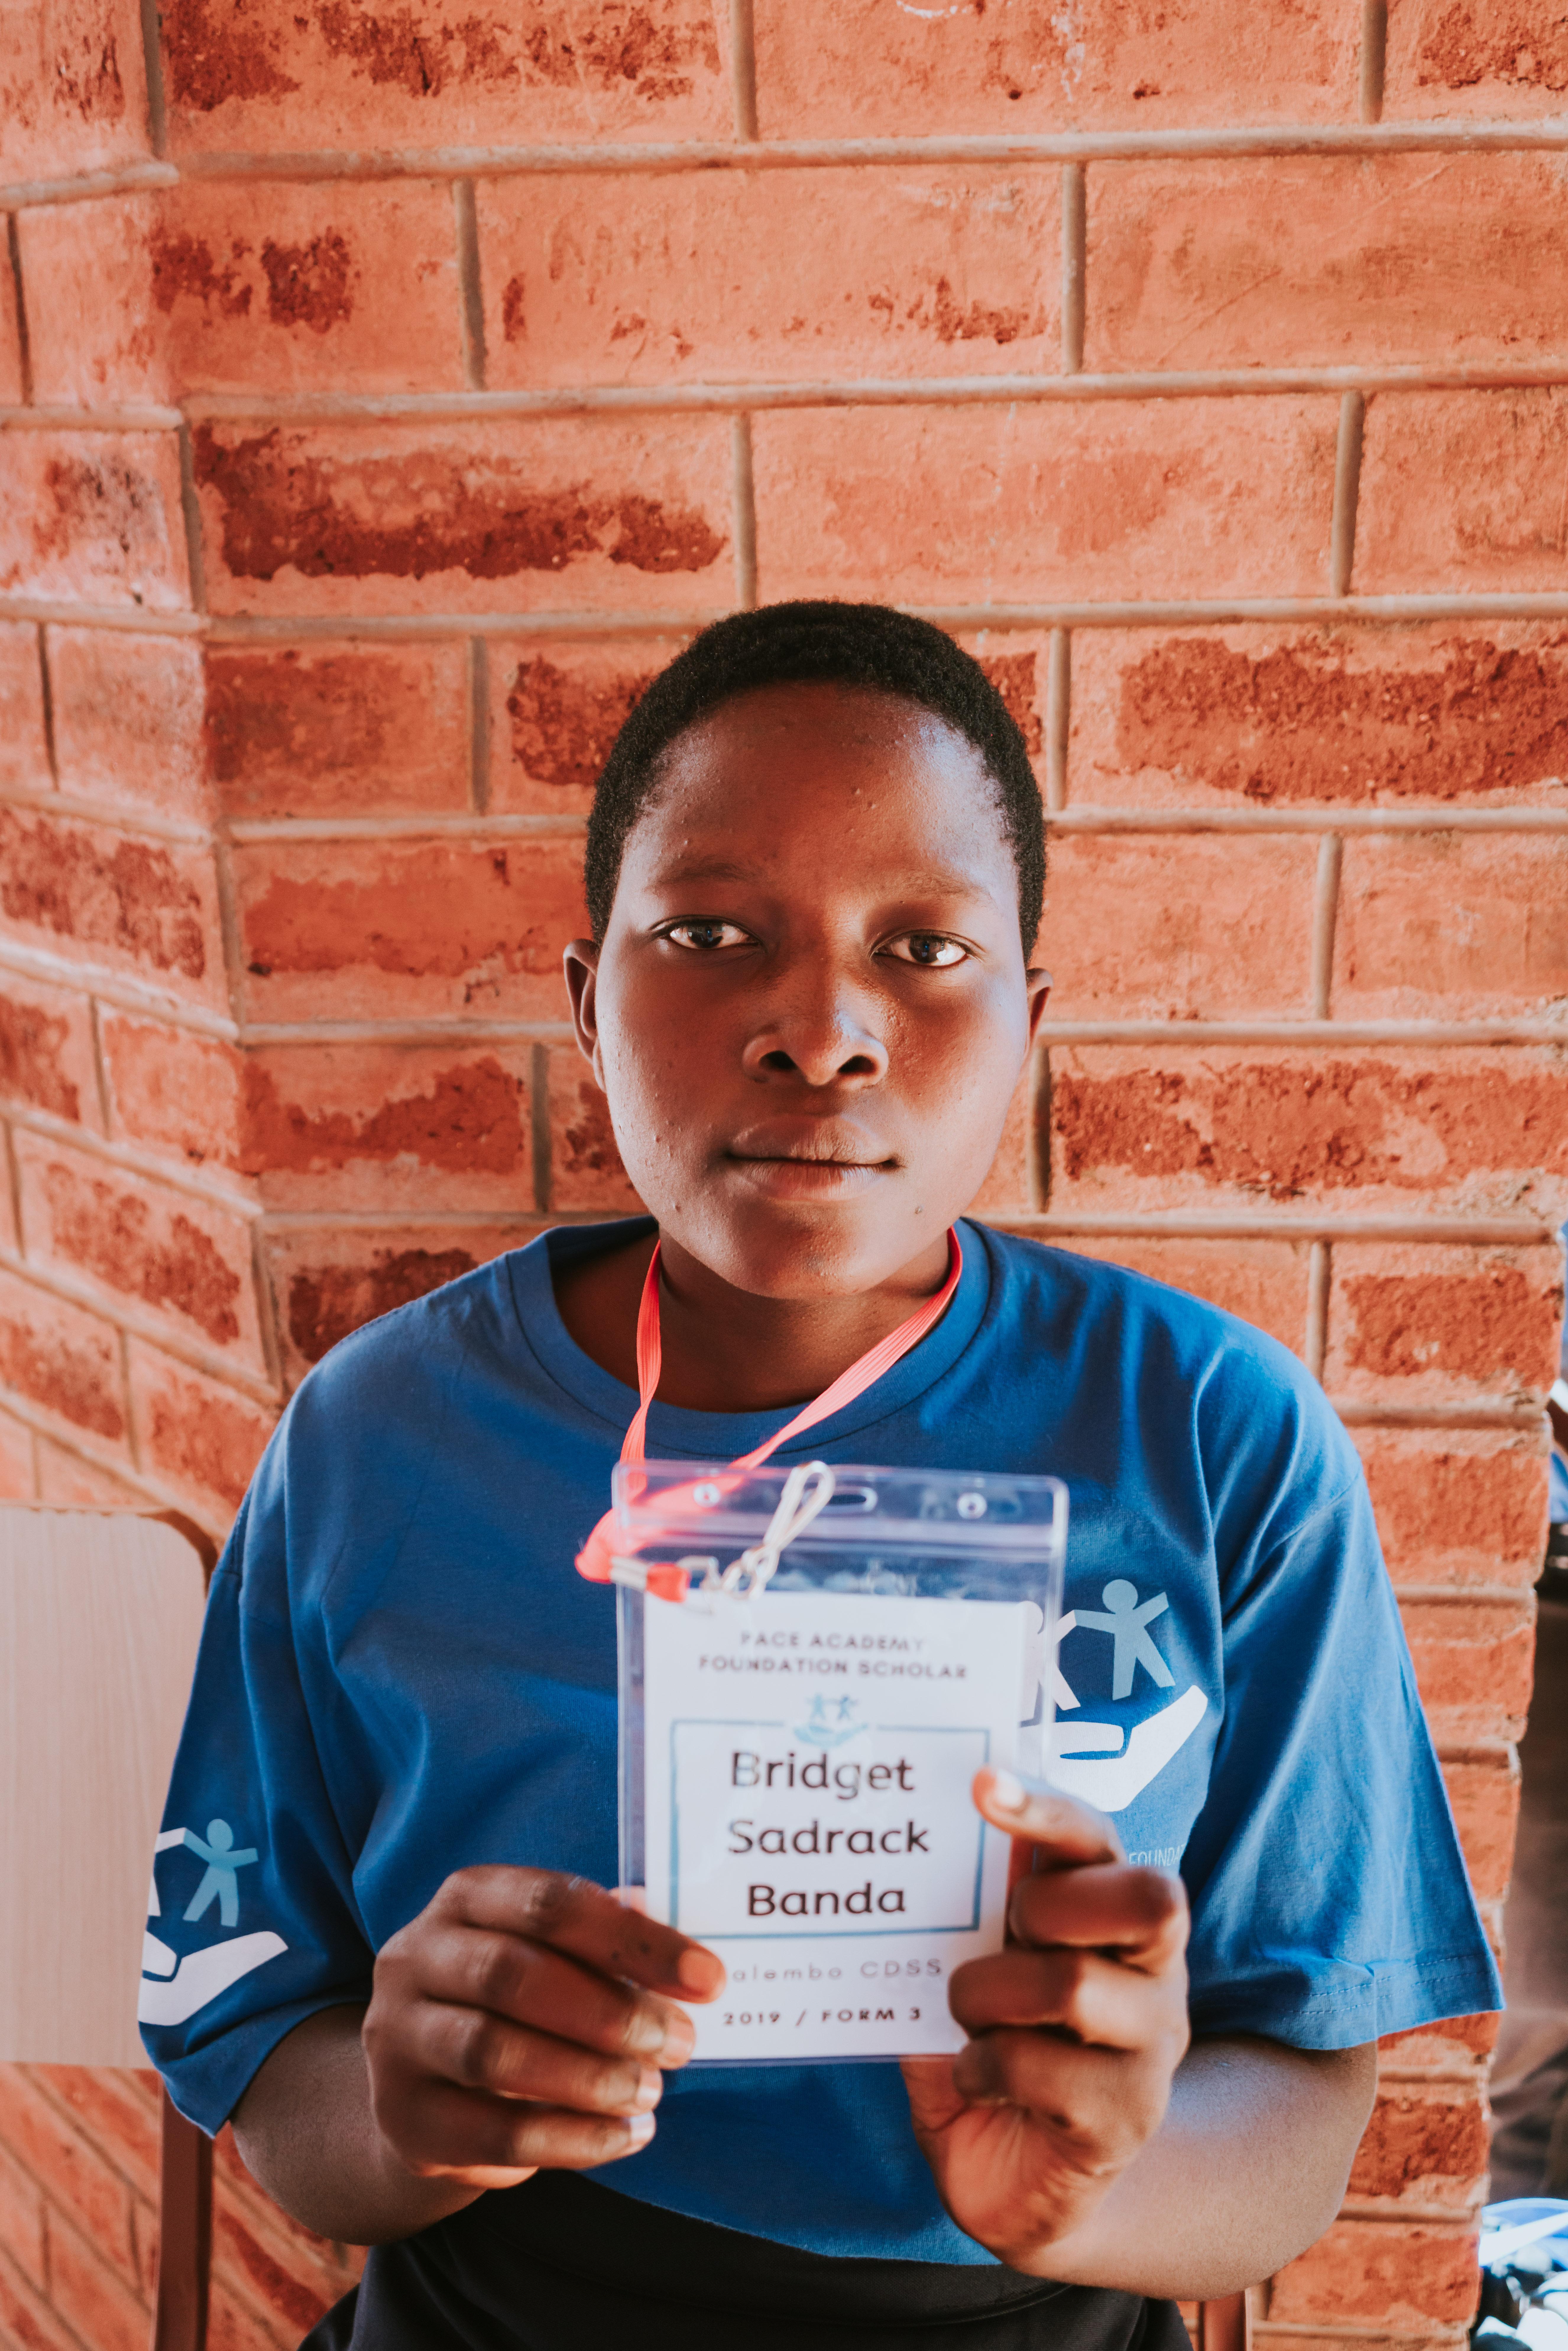 Bridget Sadrack Banda (Malembo CDSS)